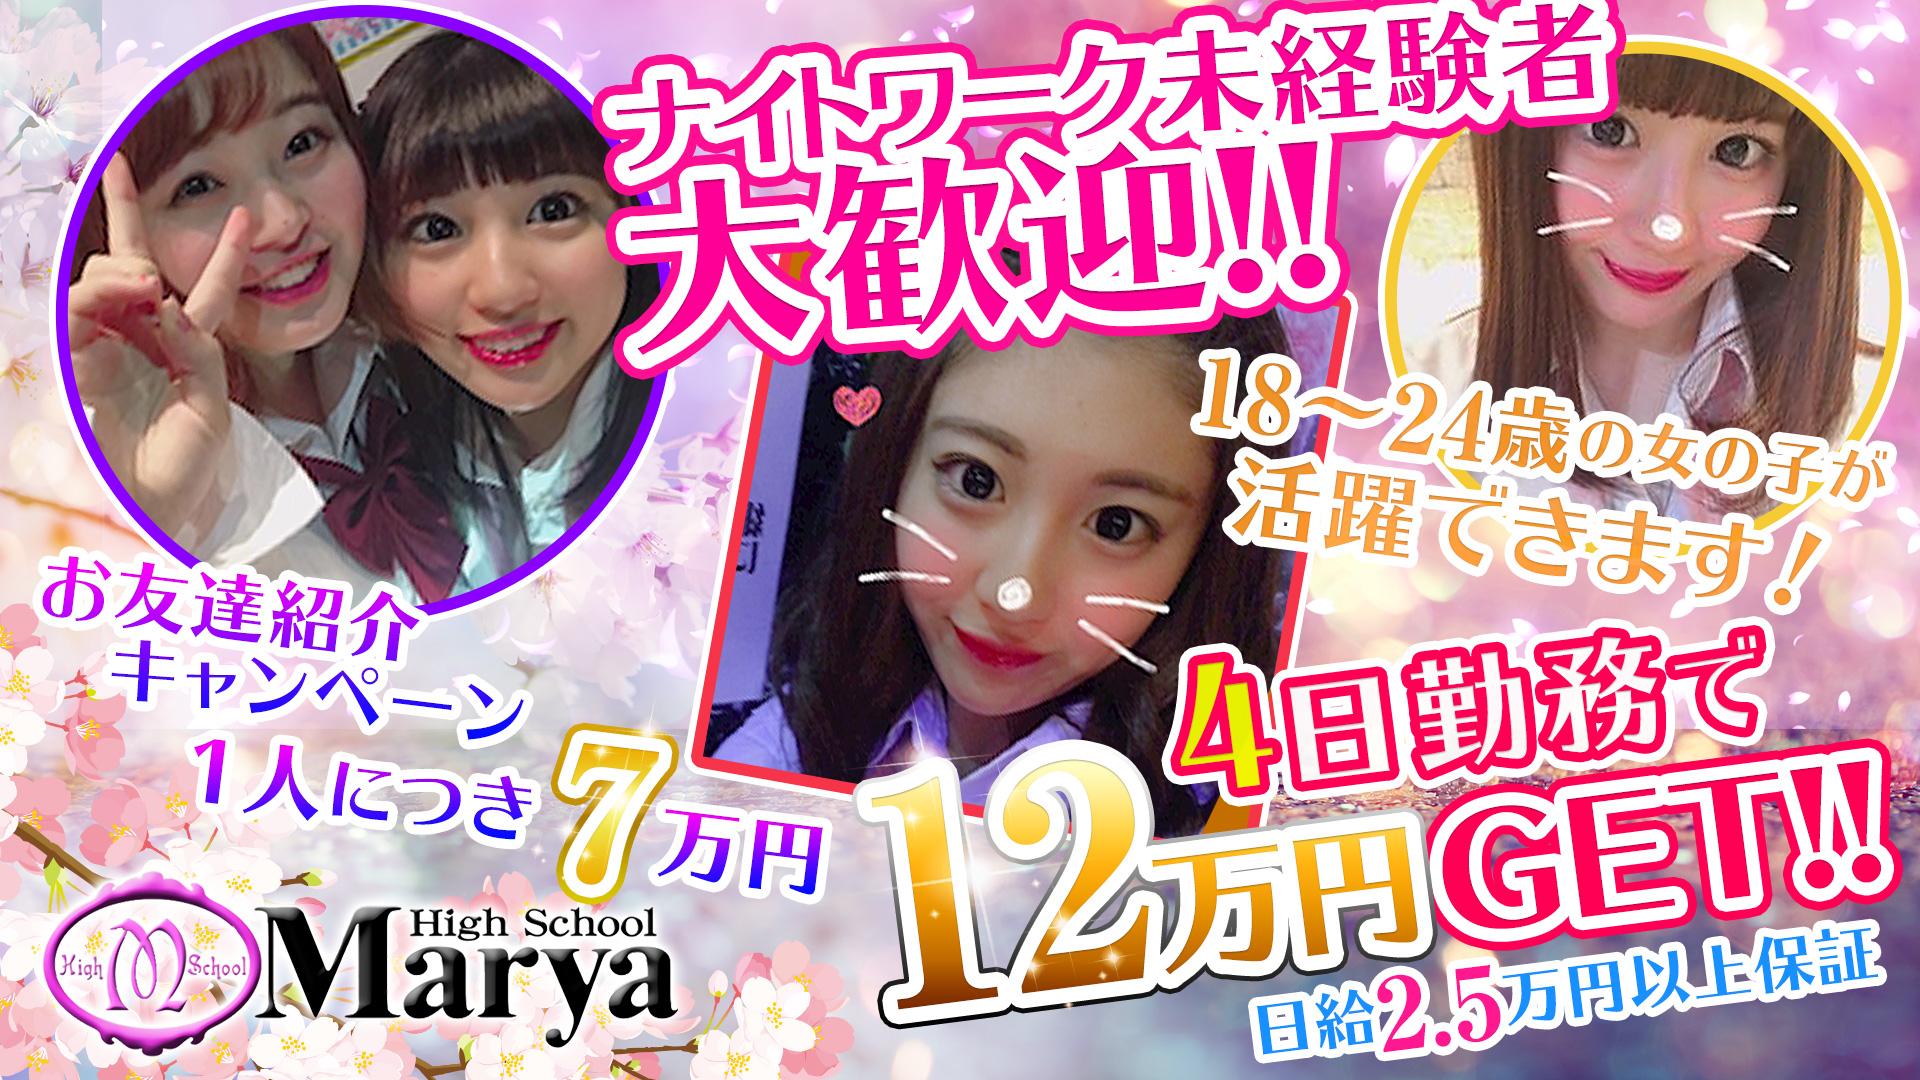 High School Marya [ハイスクール マーヤ]池袋店 池袋 キャバクラ TOP画像